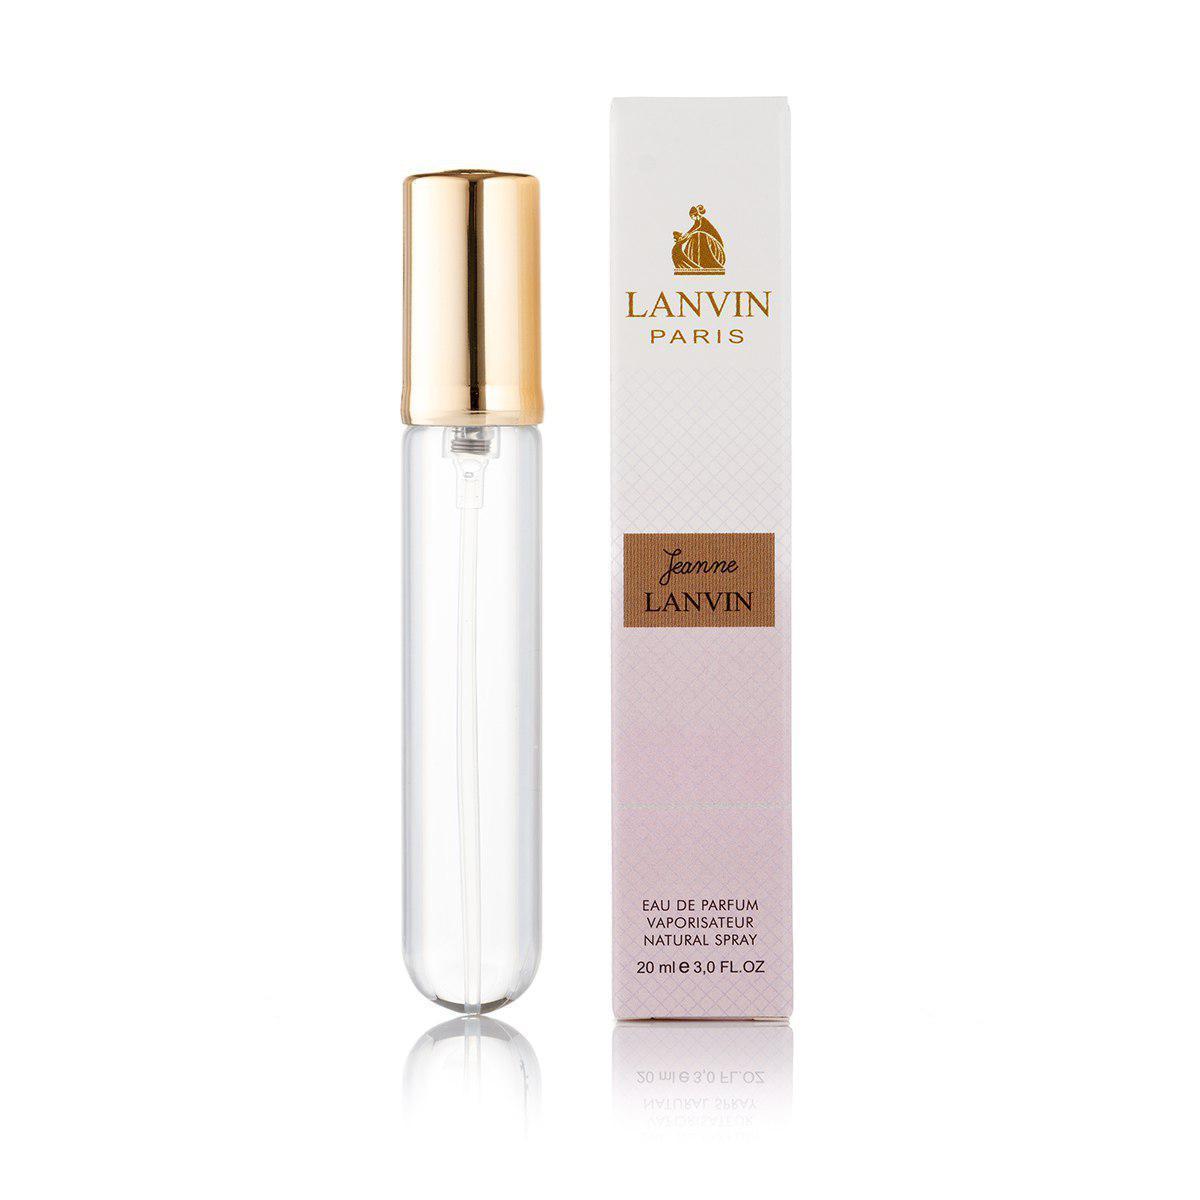 20 мл міні-парфуми Lanvin Jeanne Lanvin (ж)